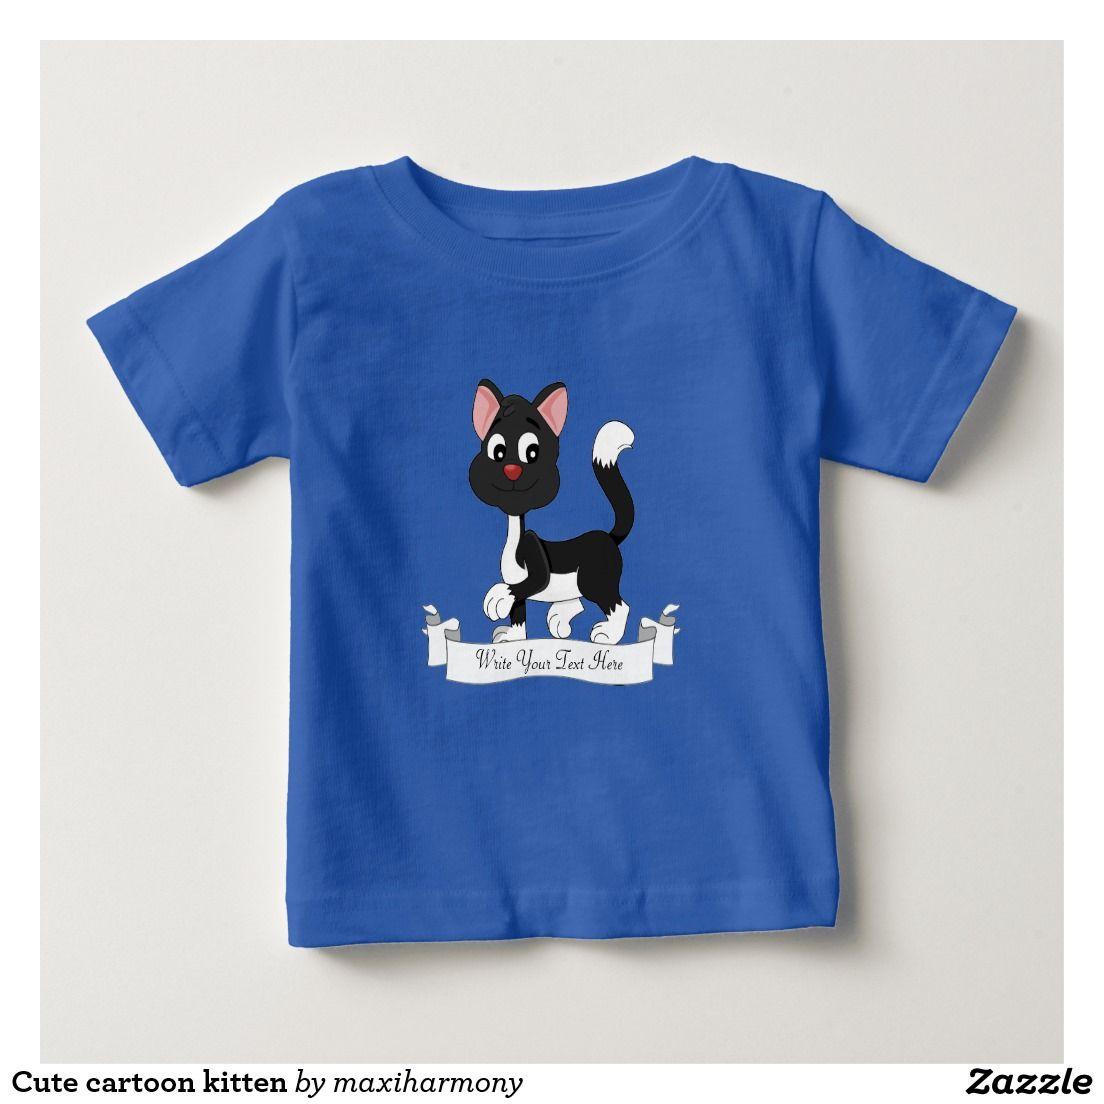 bf0a89f65e2f Cute cartoon kitten t shirts